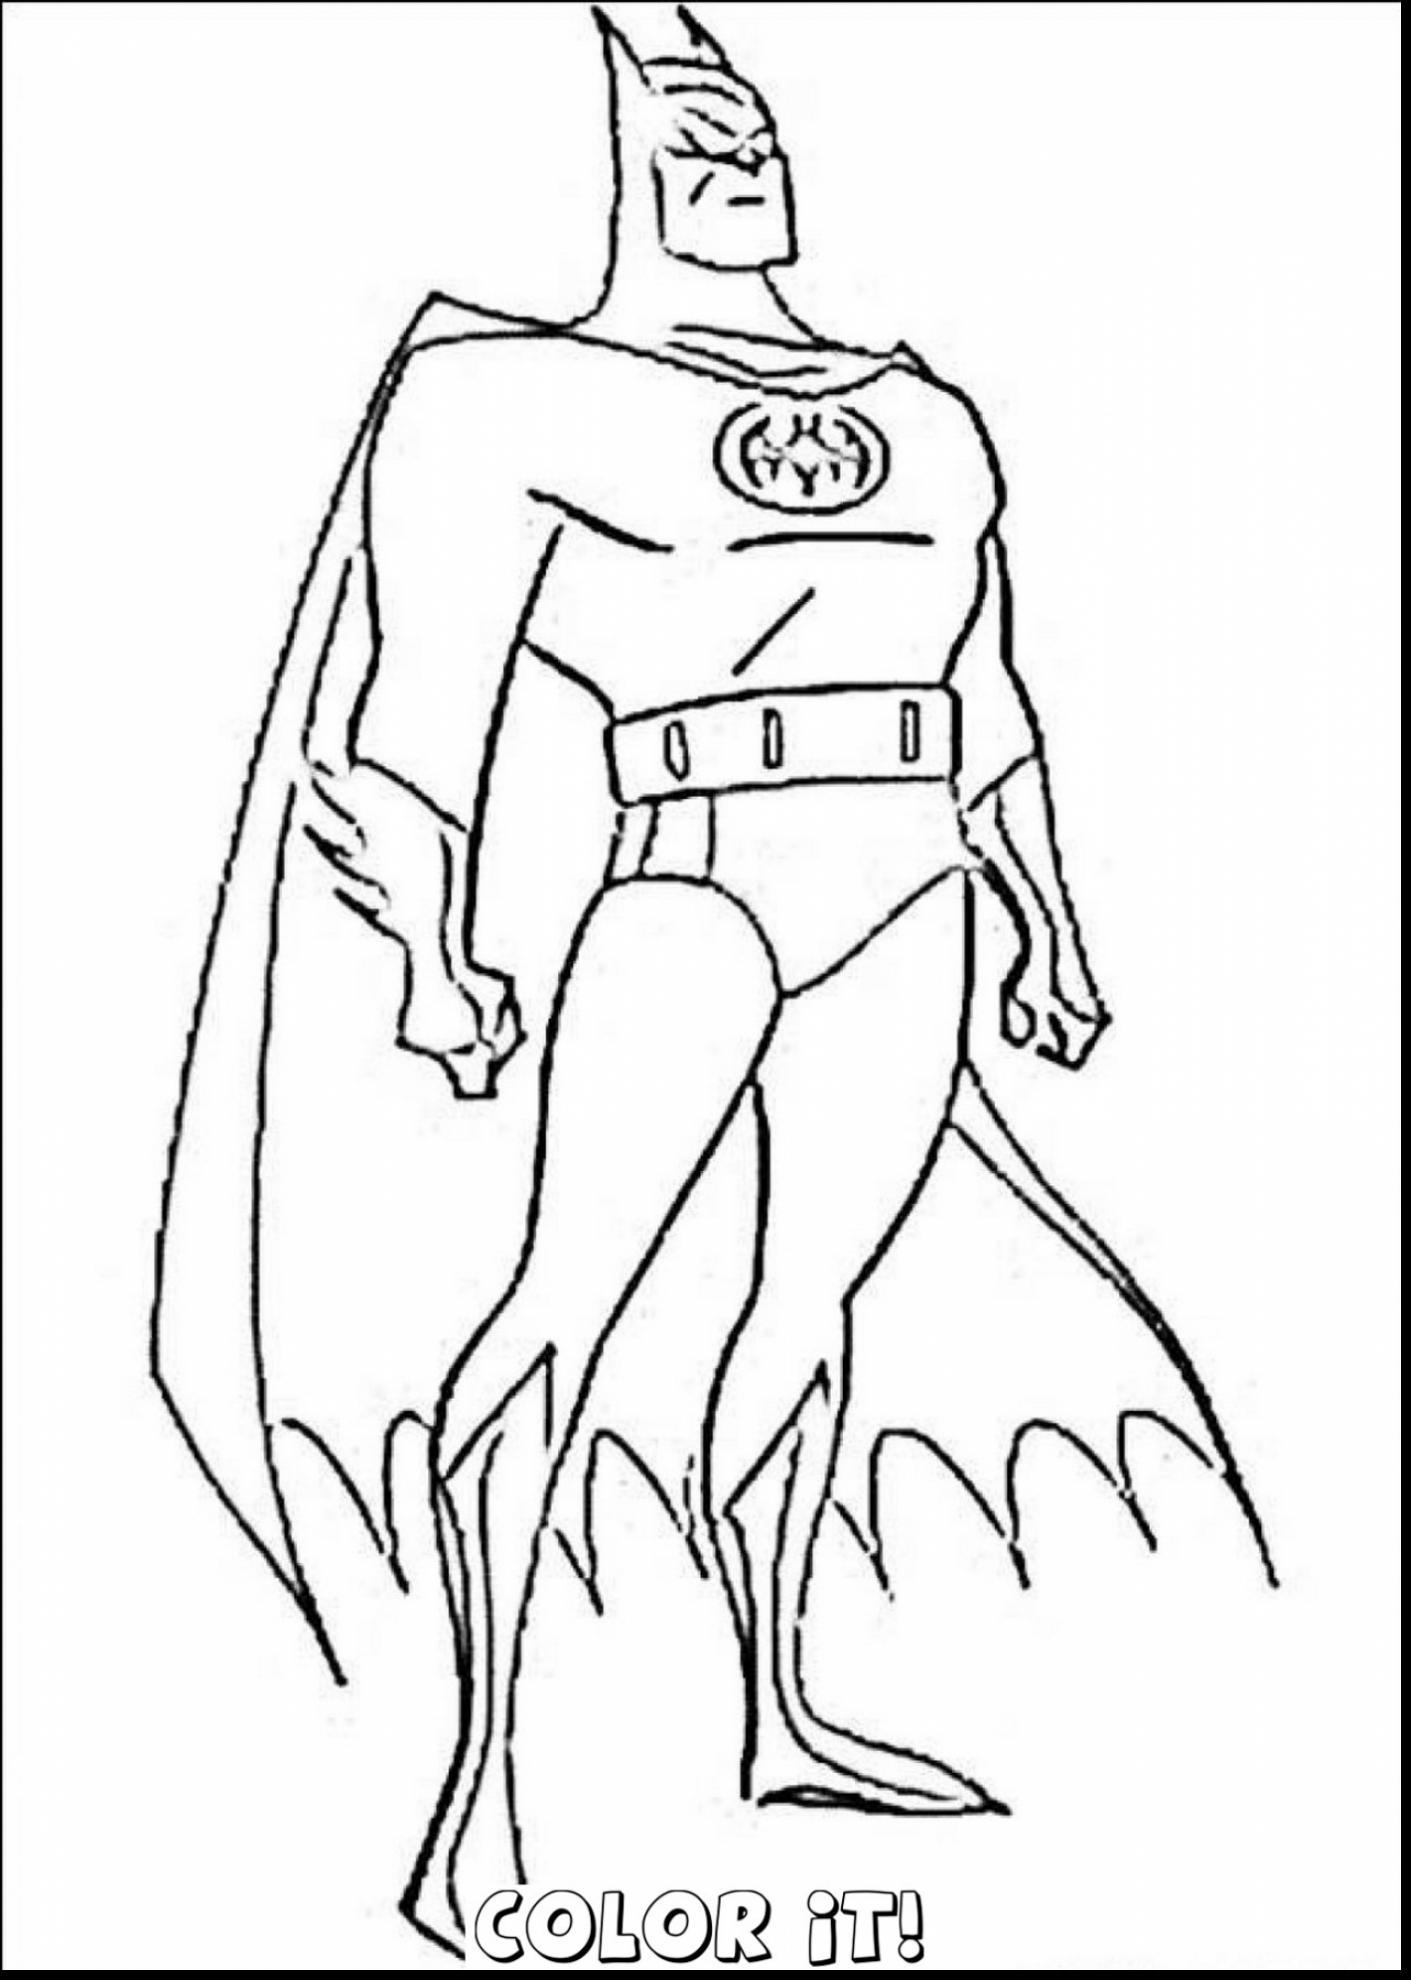 1411x1980 New Magnificent Batman Arkham Knight Coloring Pages With Batman